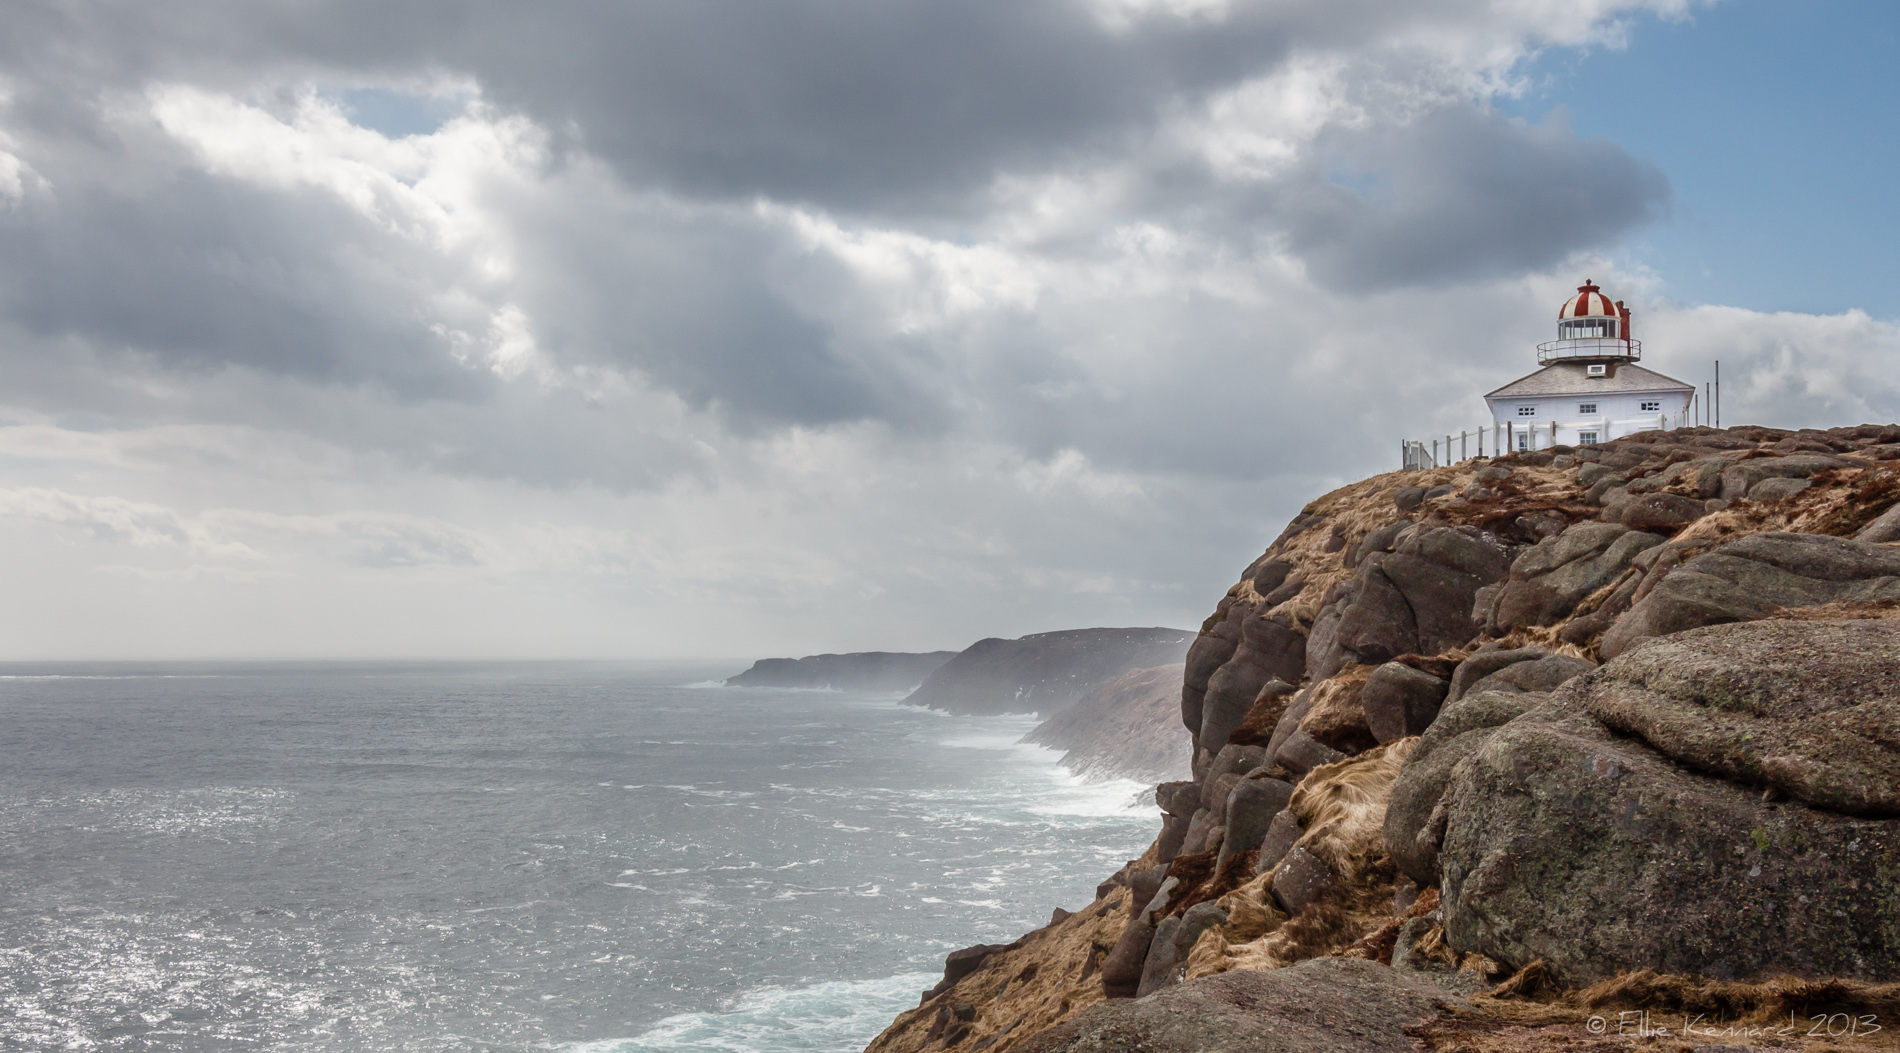 Old Cape Spear Lighthouse, Newfoundland - Ellie Kennard 2013